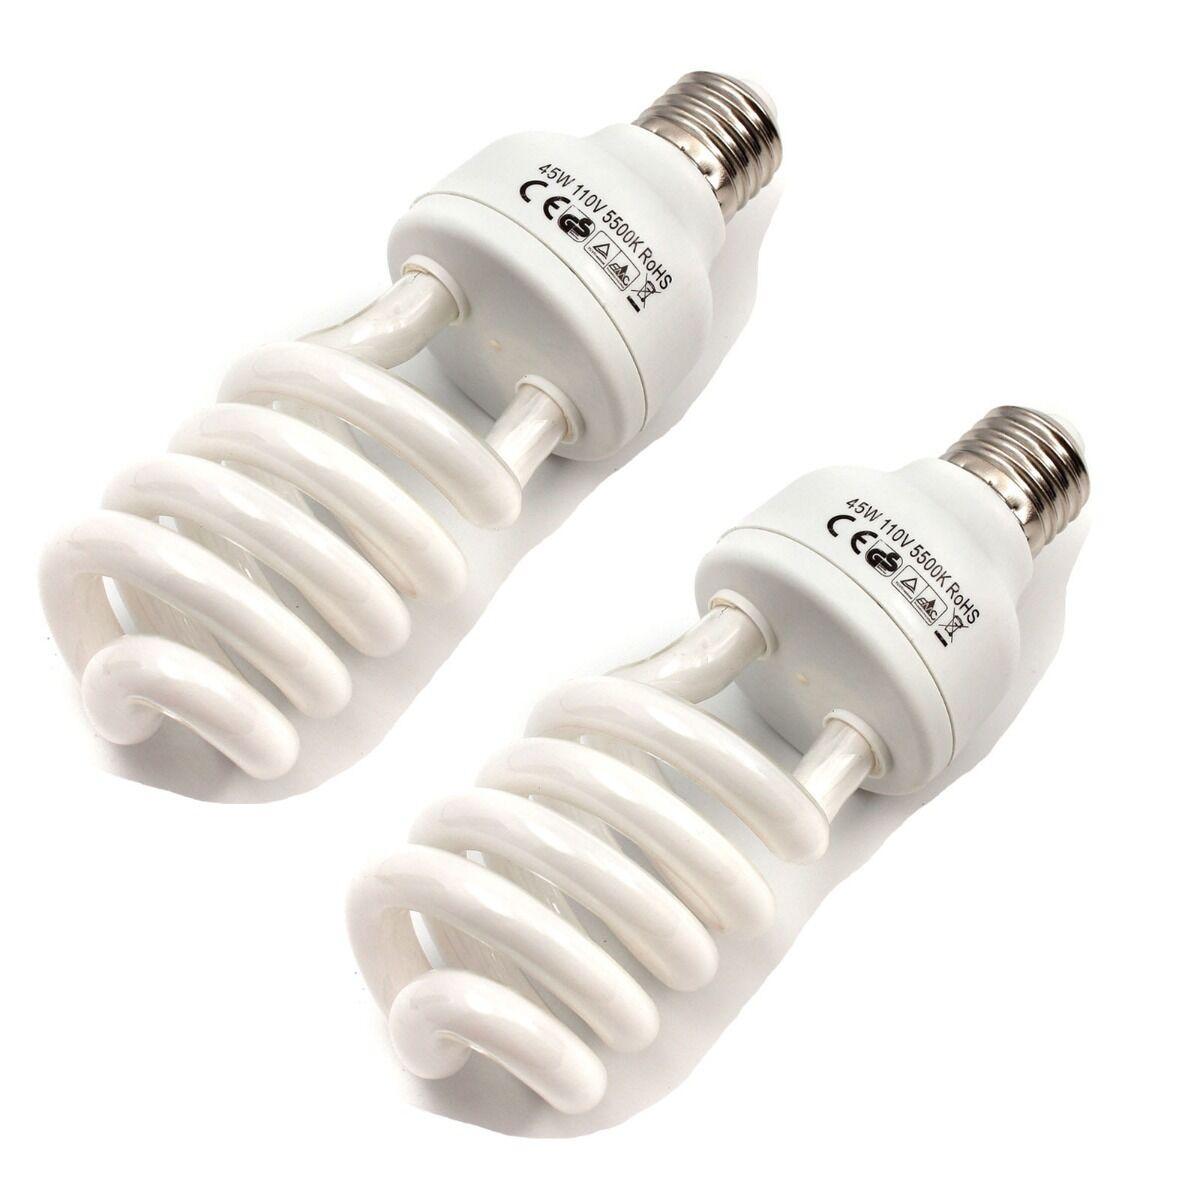 2x 45w 5500k Photo Studio Energy Saving Day Light Bulbs Compact Fluorescent Lamp Ebay